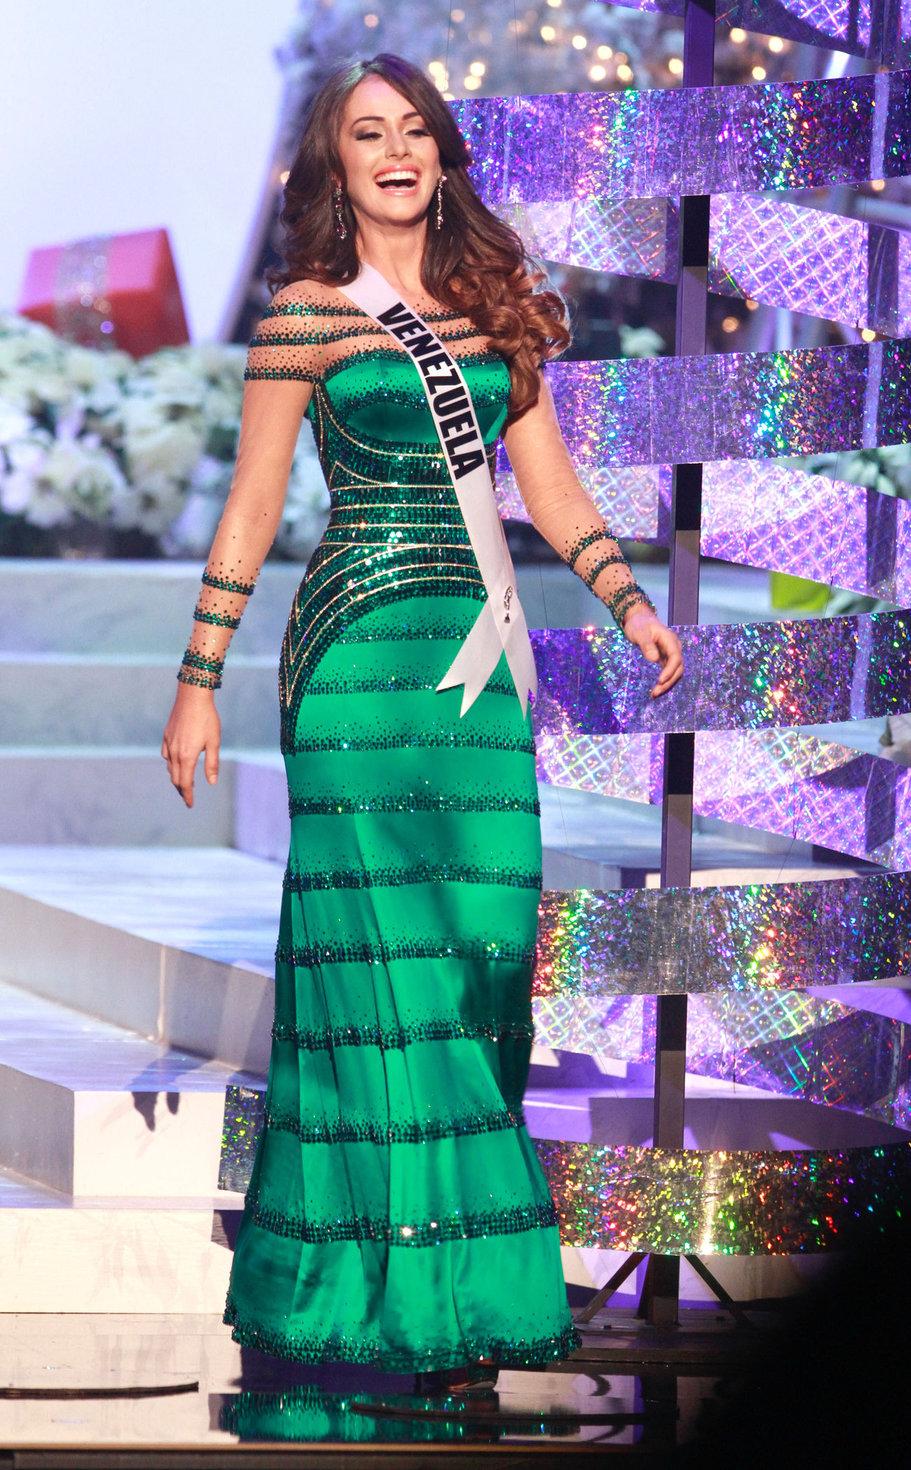 Miss Universe 2018 Images >> Irene Esser Pictures